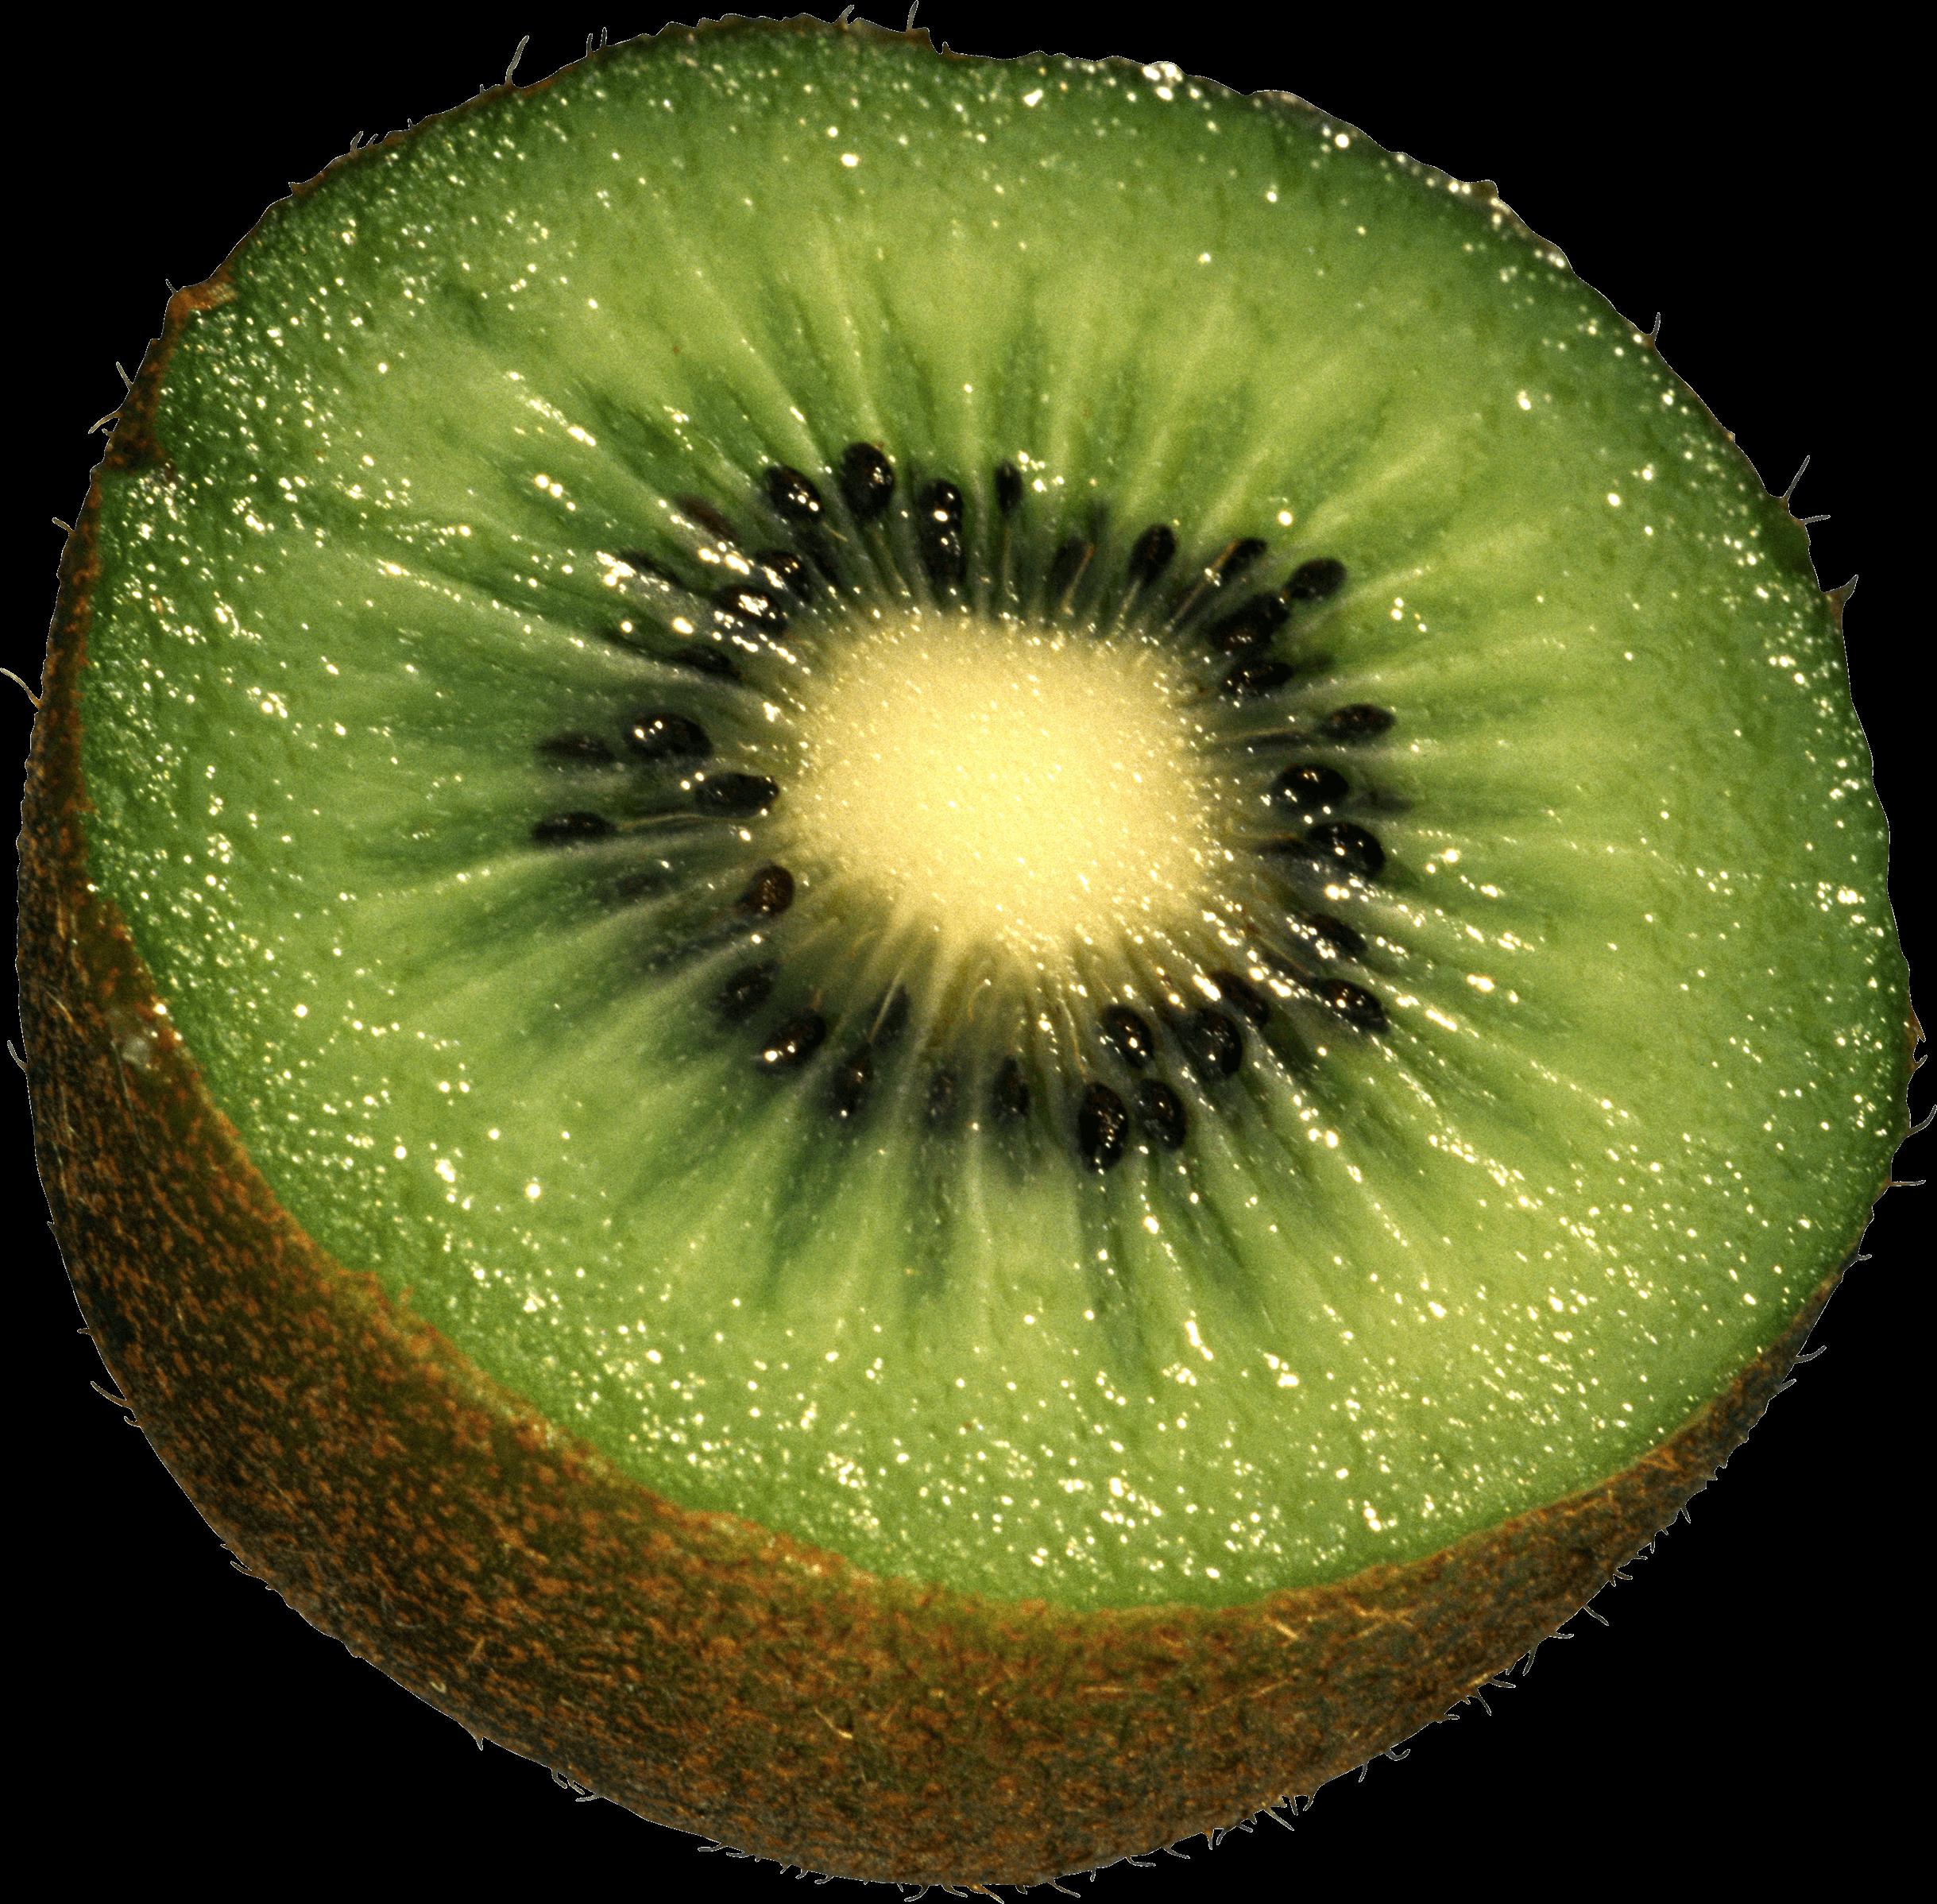 Kiwi clipart kiwi fruit. Open transparent png stickpng